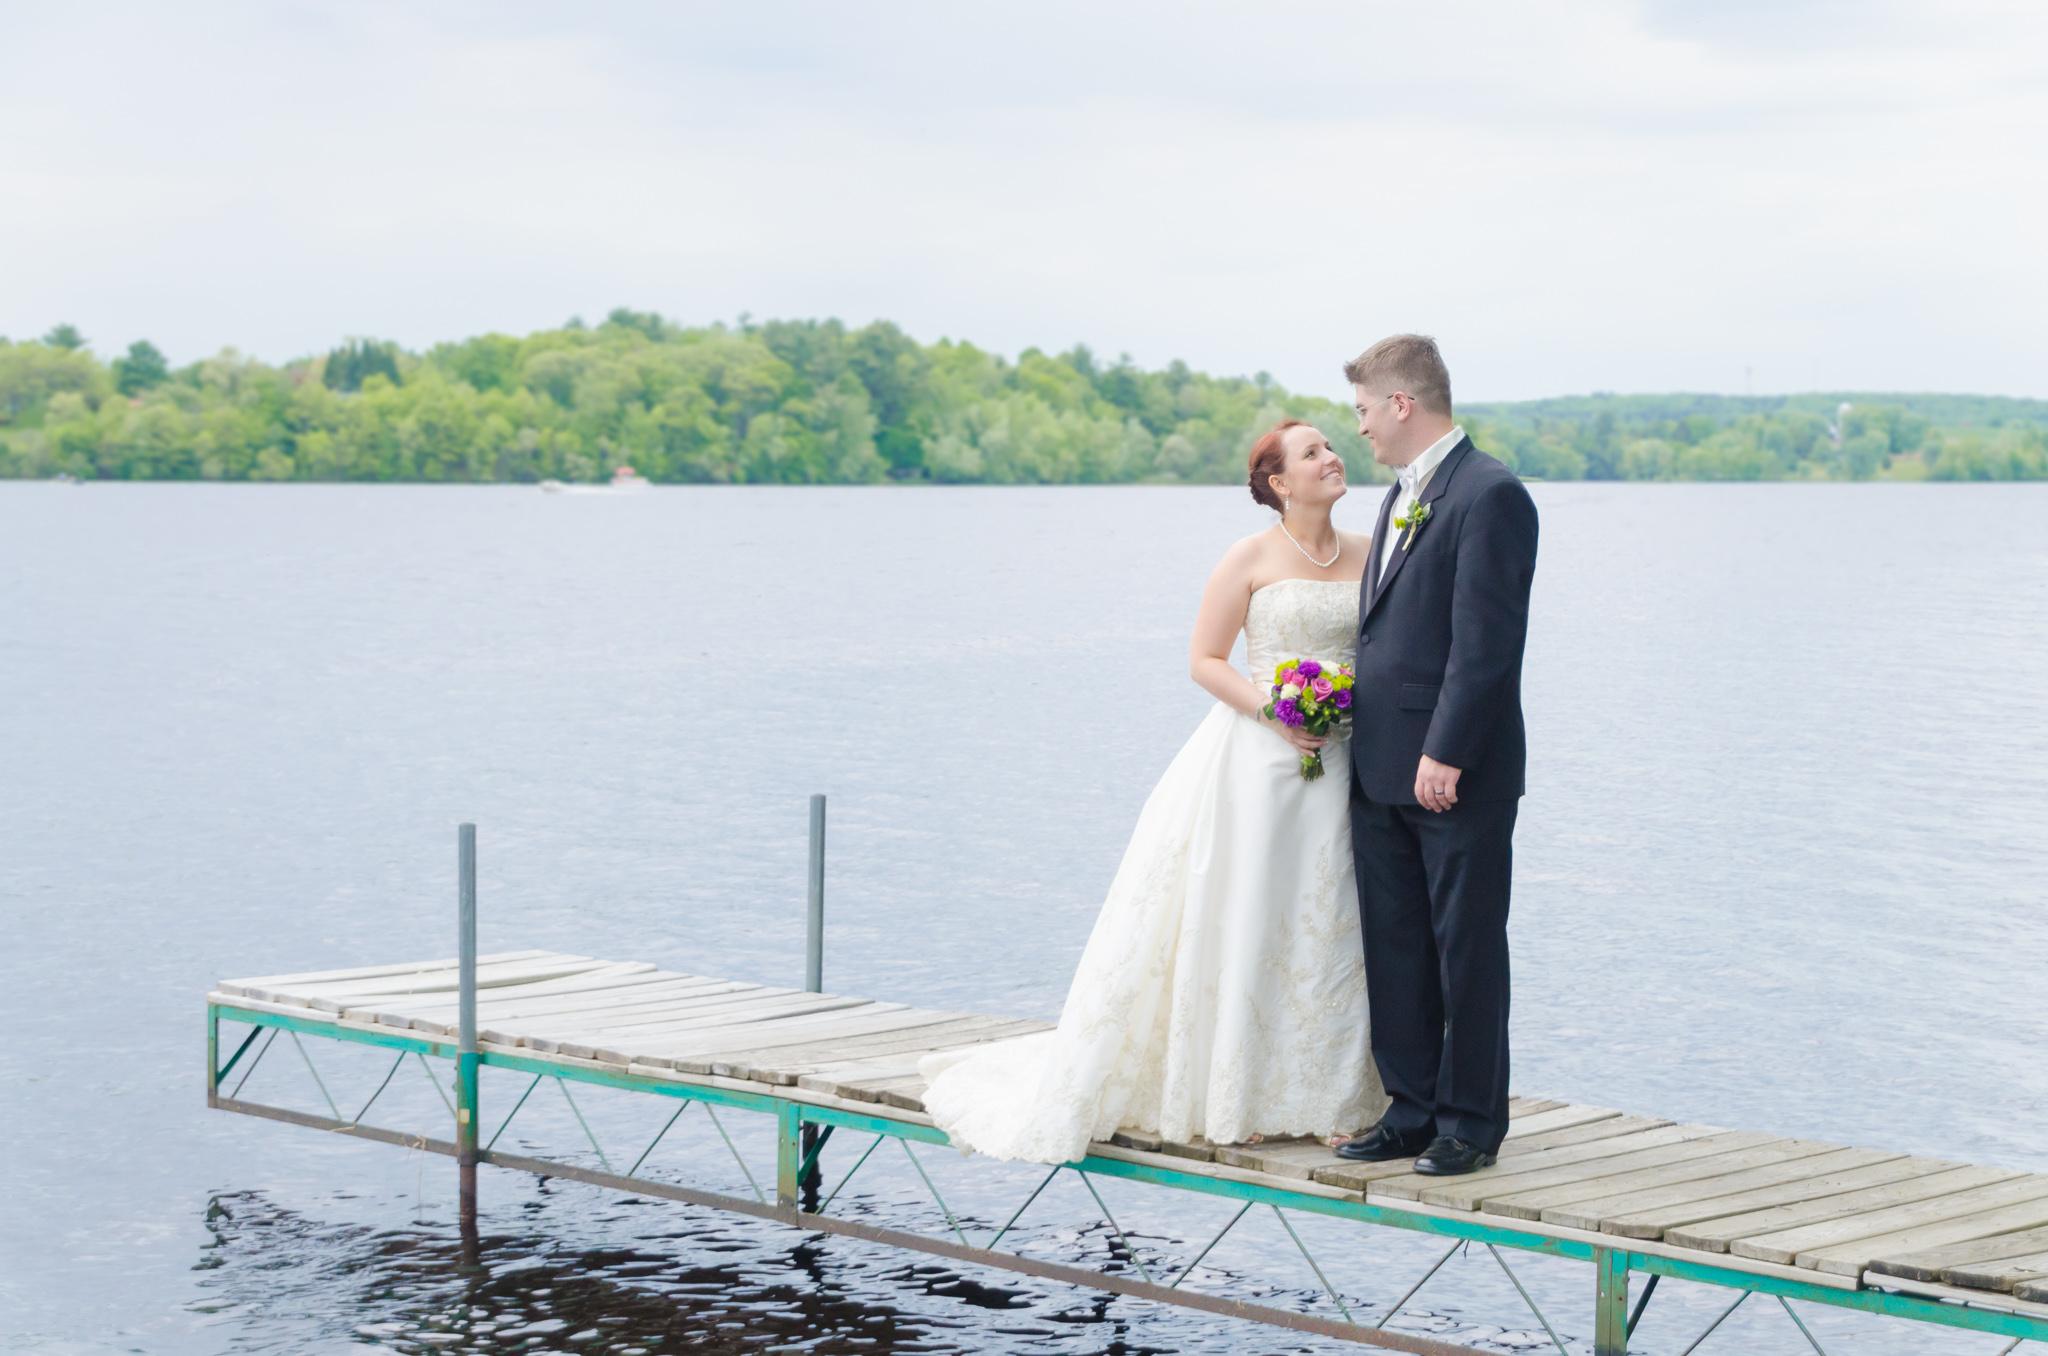 Chippewa falls wisconsin wedding photographer lake wissota golf .jpg